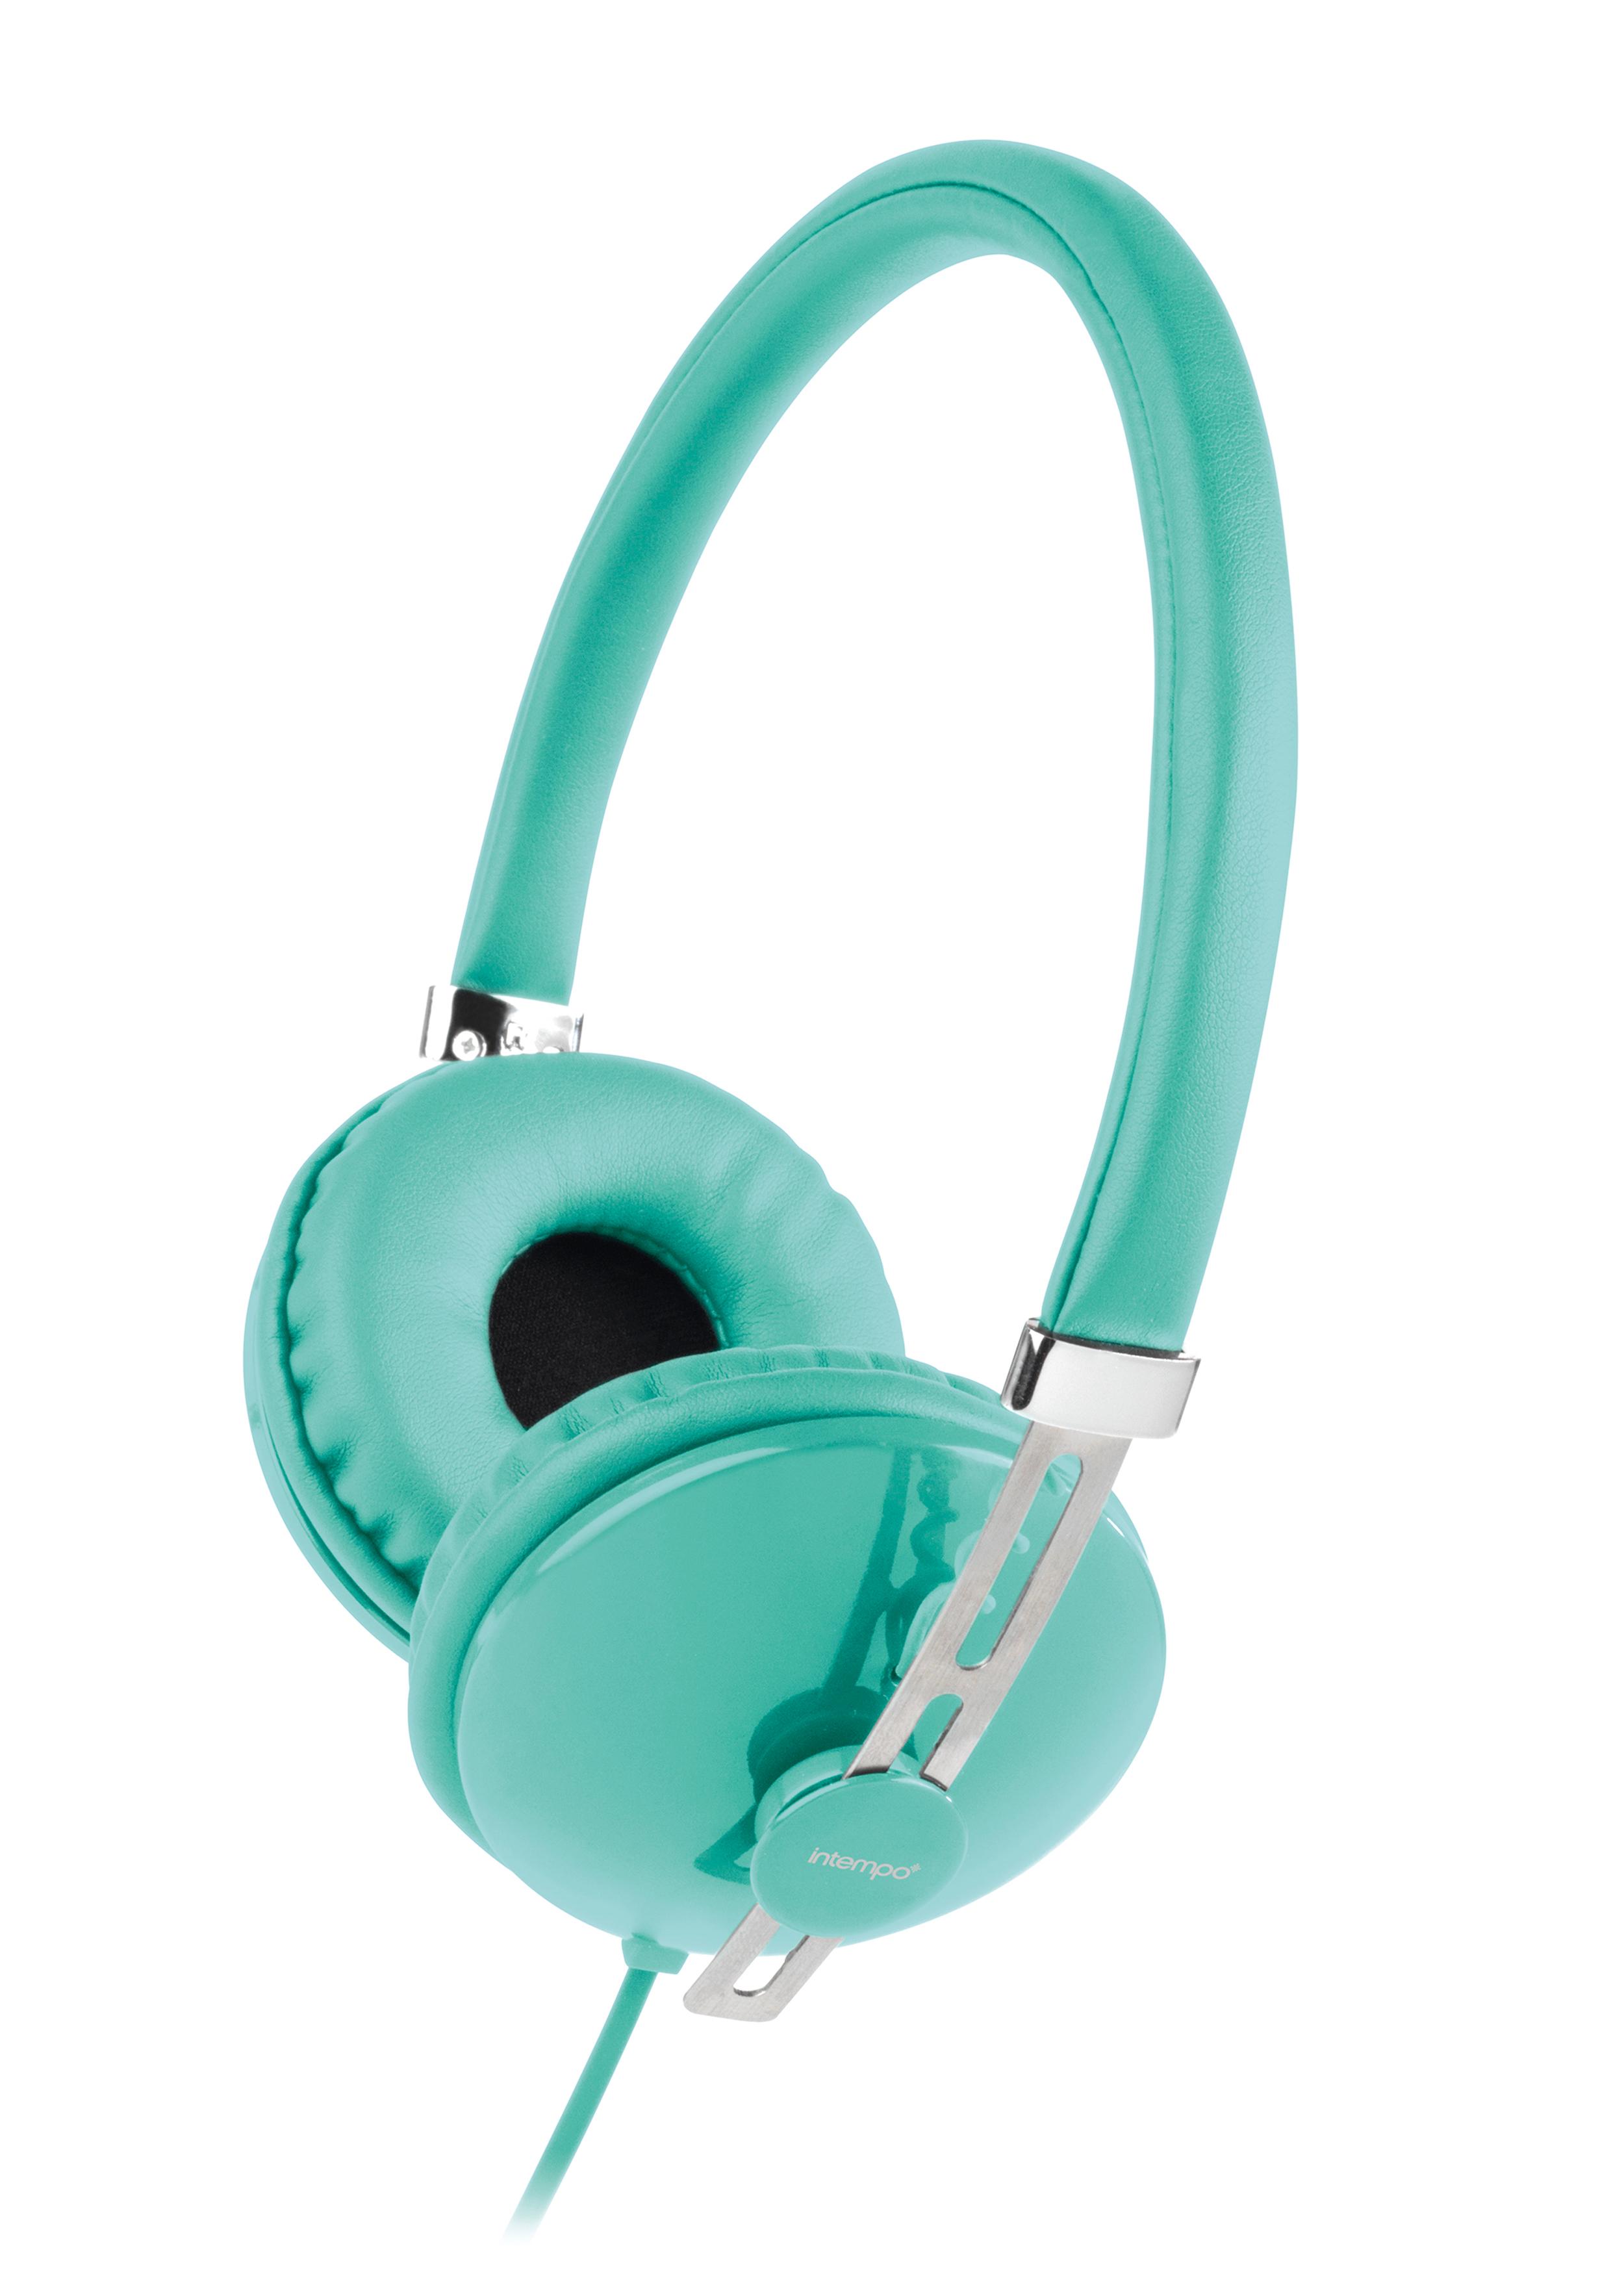 Intempo EE1054AQ Hubbub Over-Ear Headphones for iPhone, iPad, iPod,  Samsung, Smartphones, Tablets and More, 1 2m Cable, Aqua Green